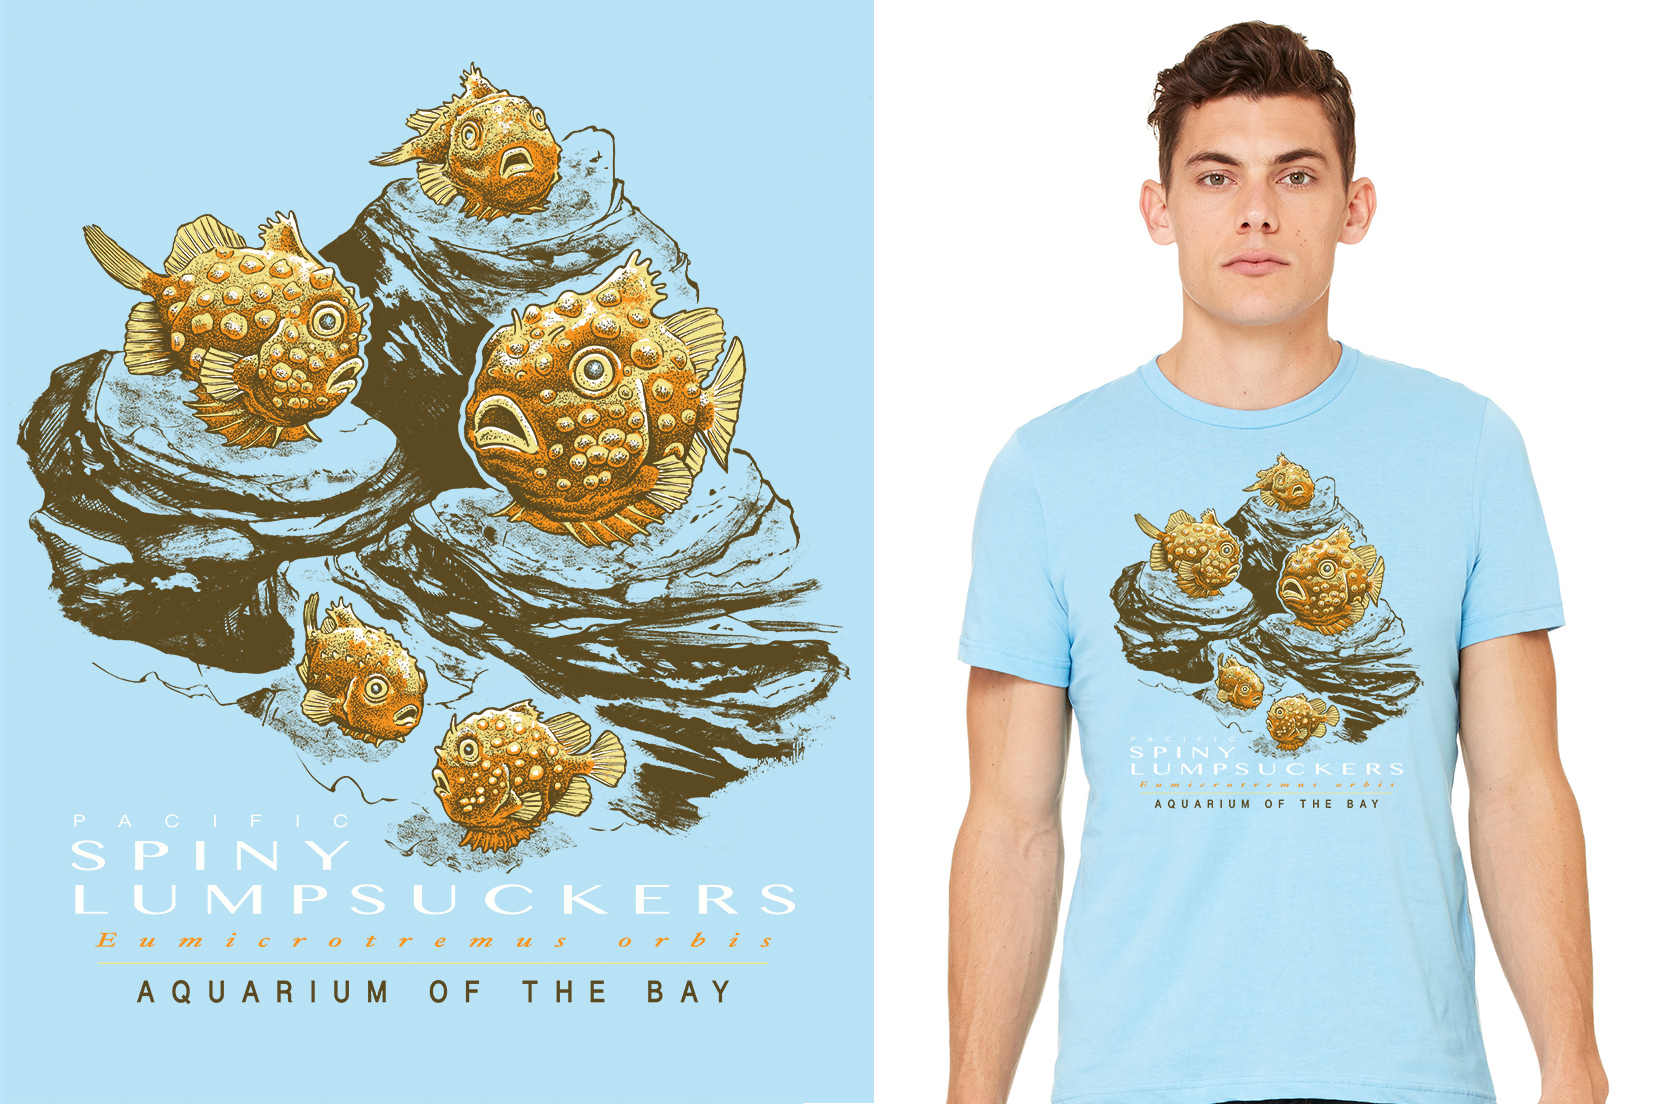 Aquarium of the Bay lumpsucker shirt